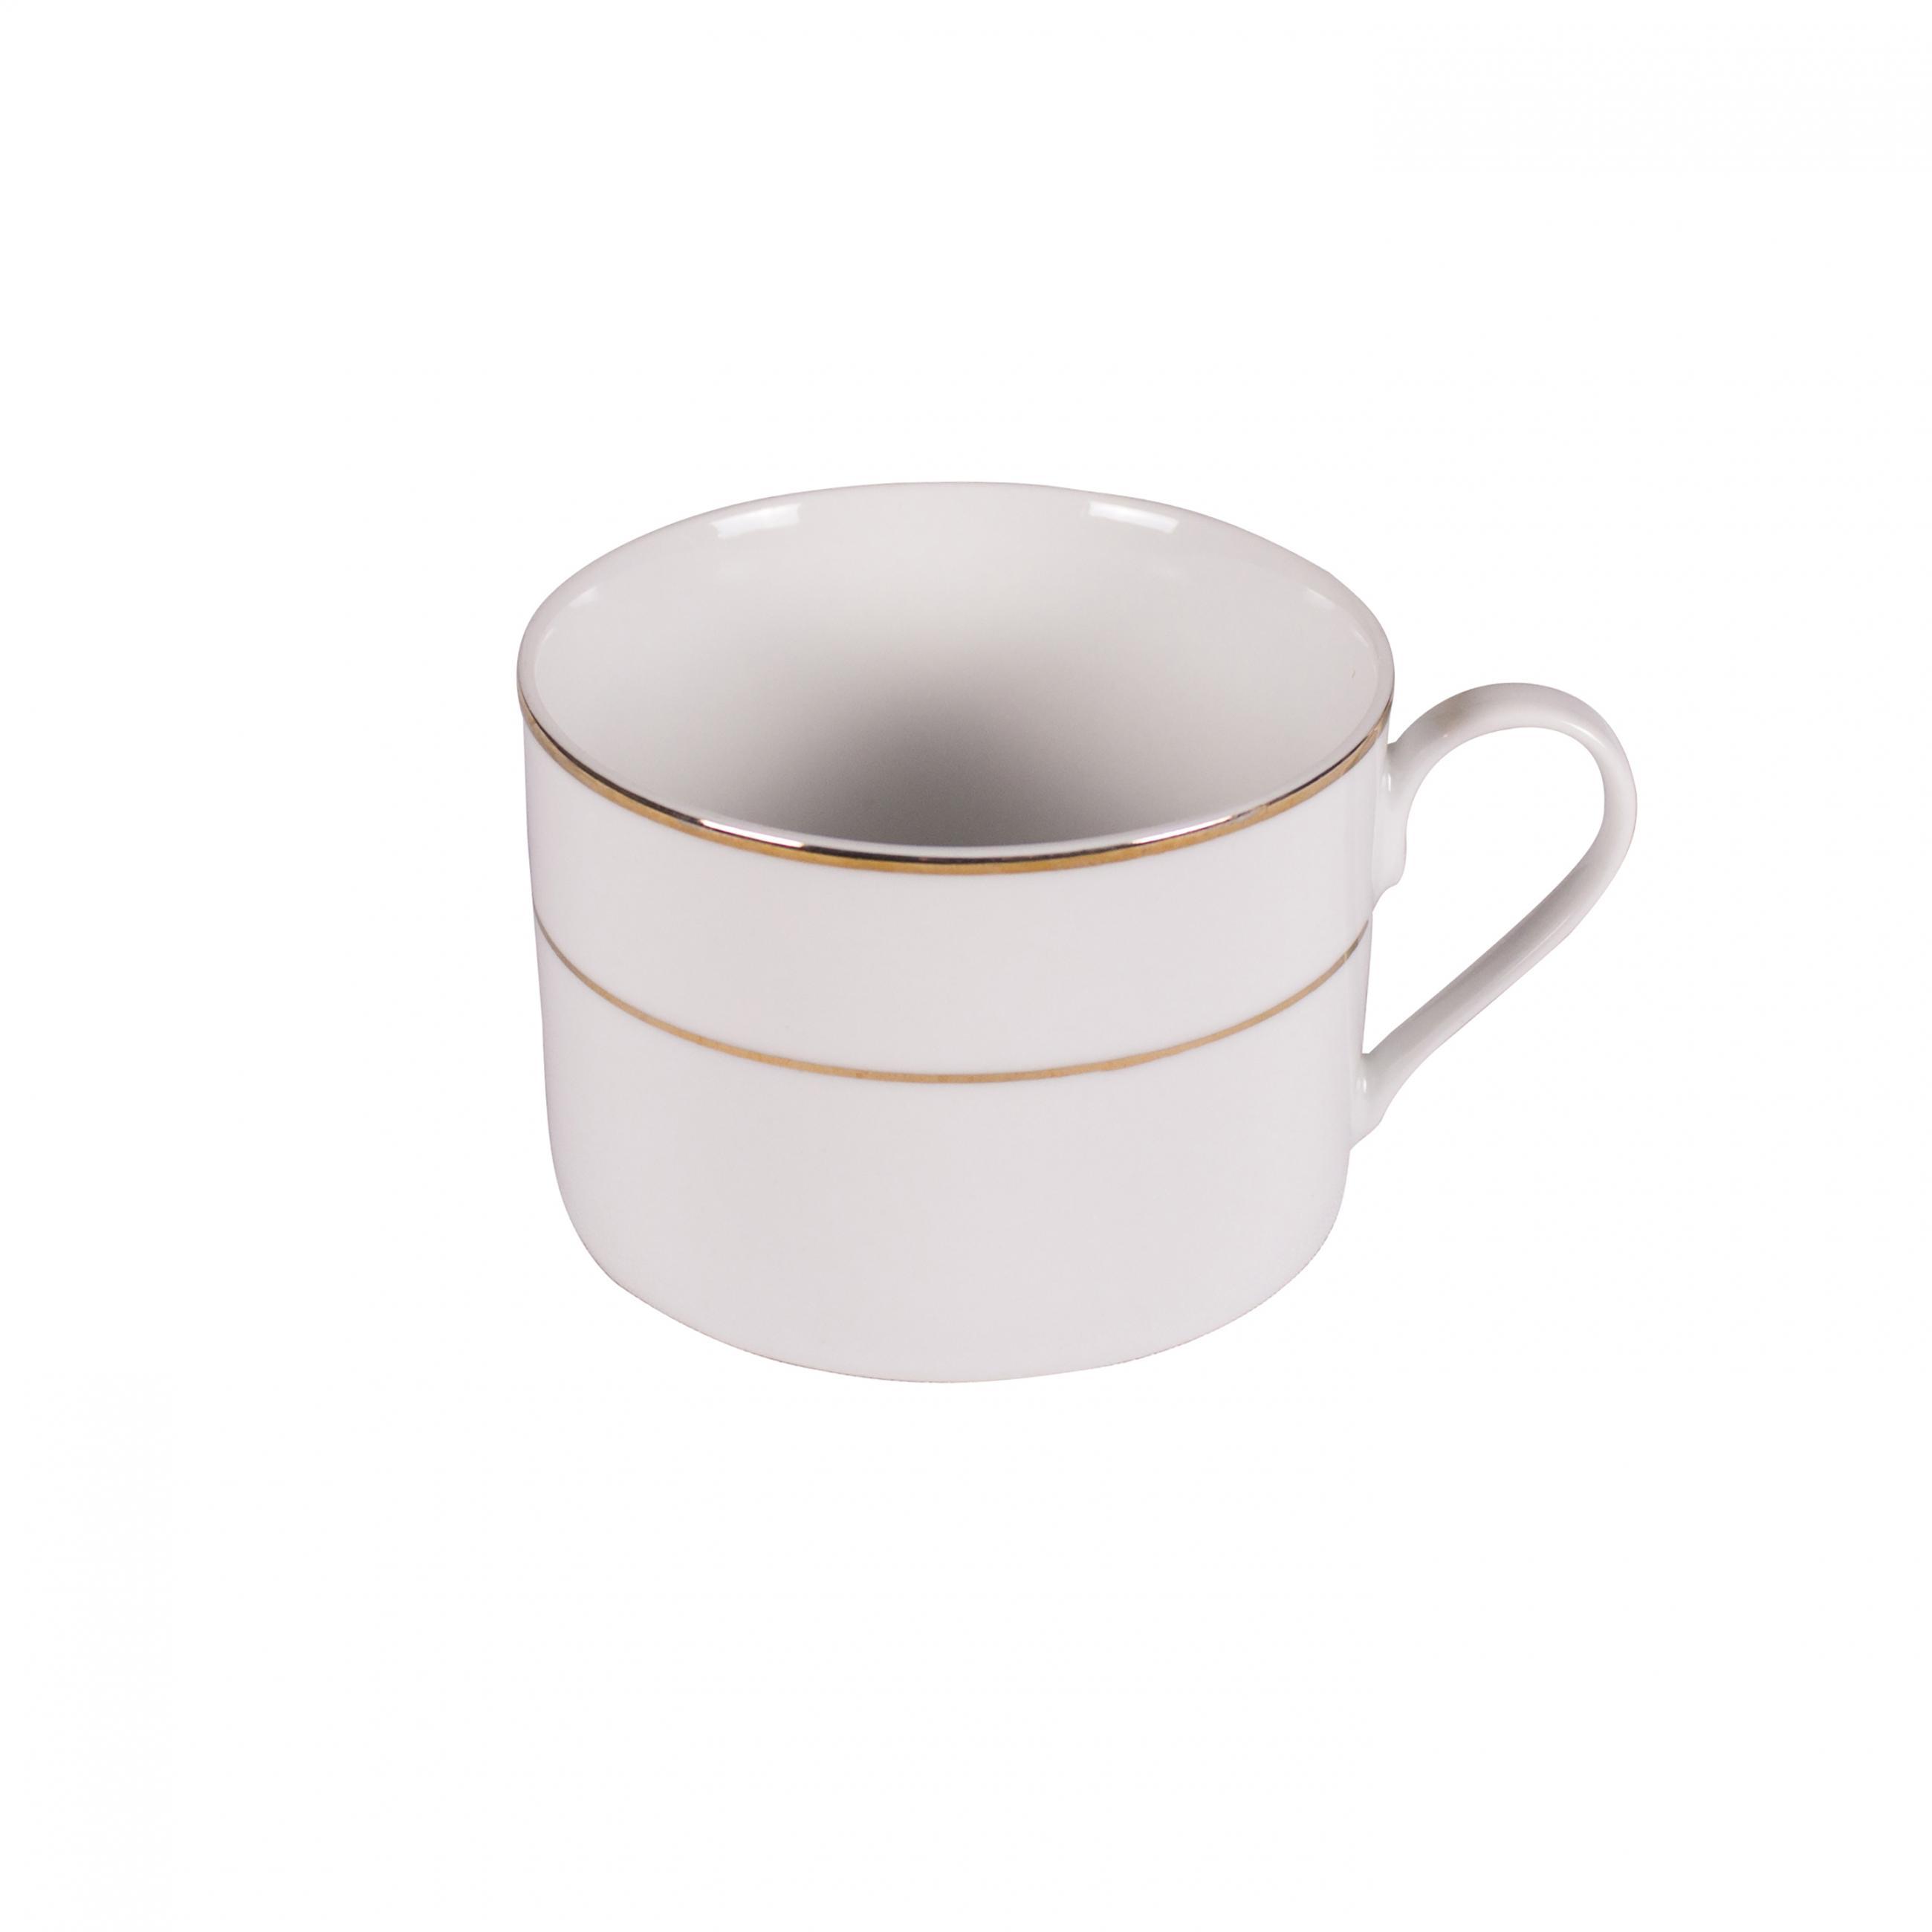 8oz White W Thin Gold Rim Short Coffee Cup Peak Event Services